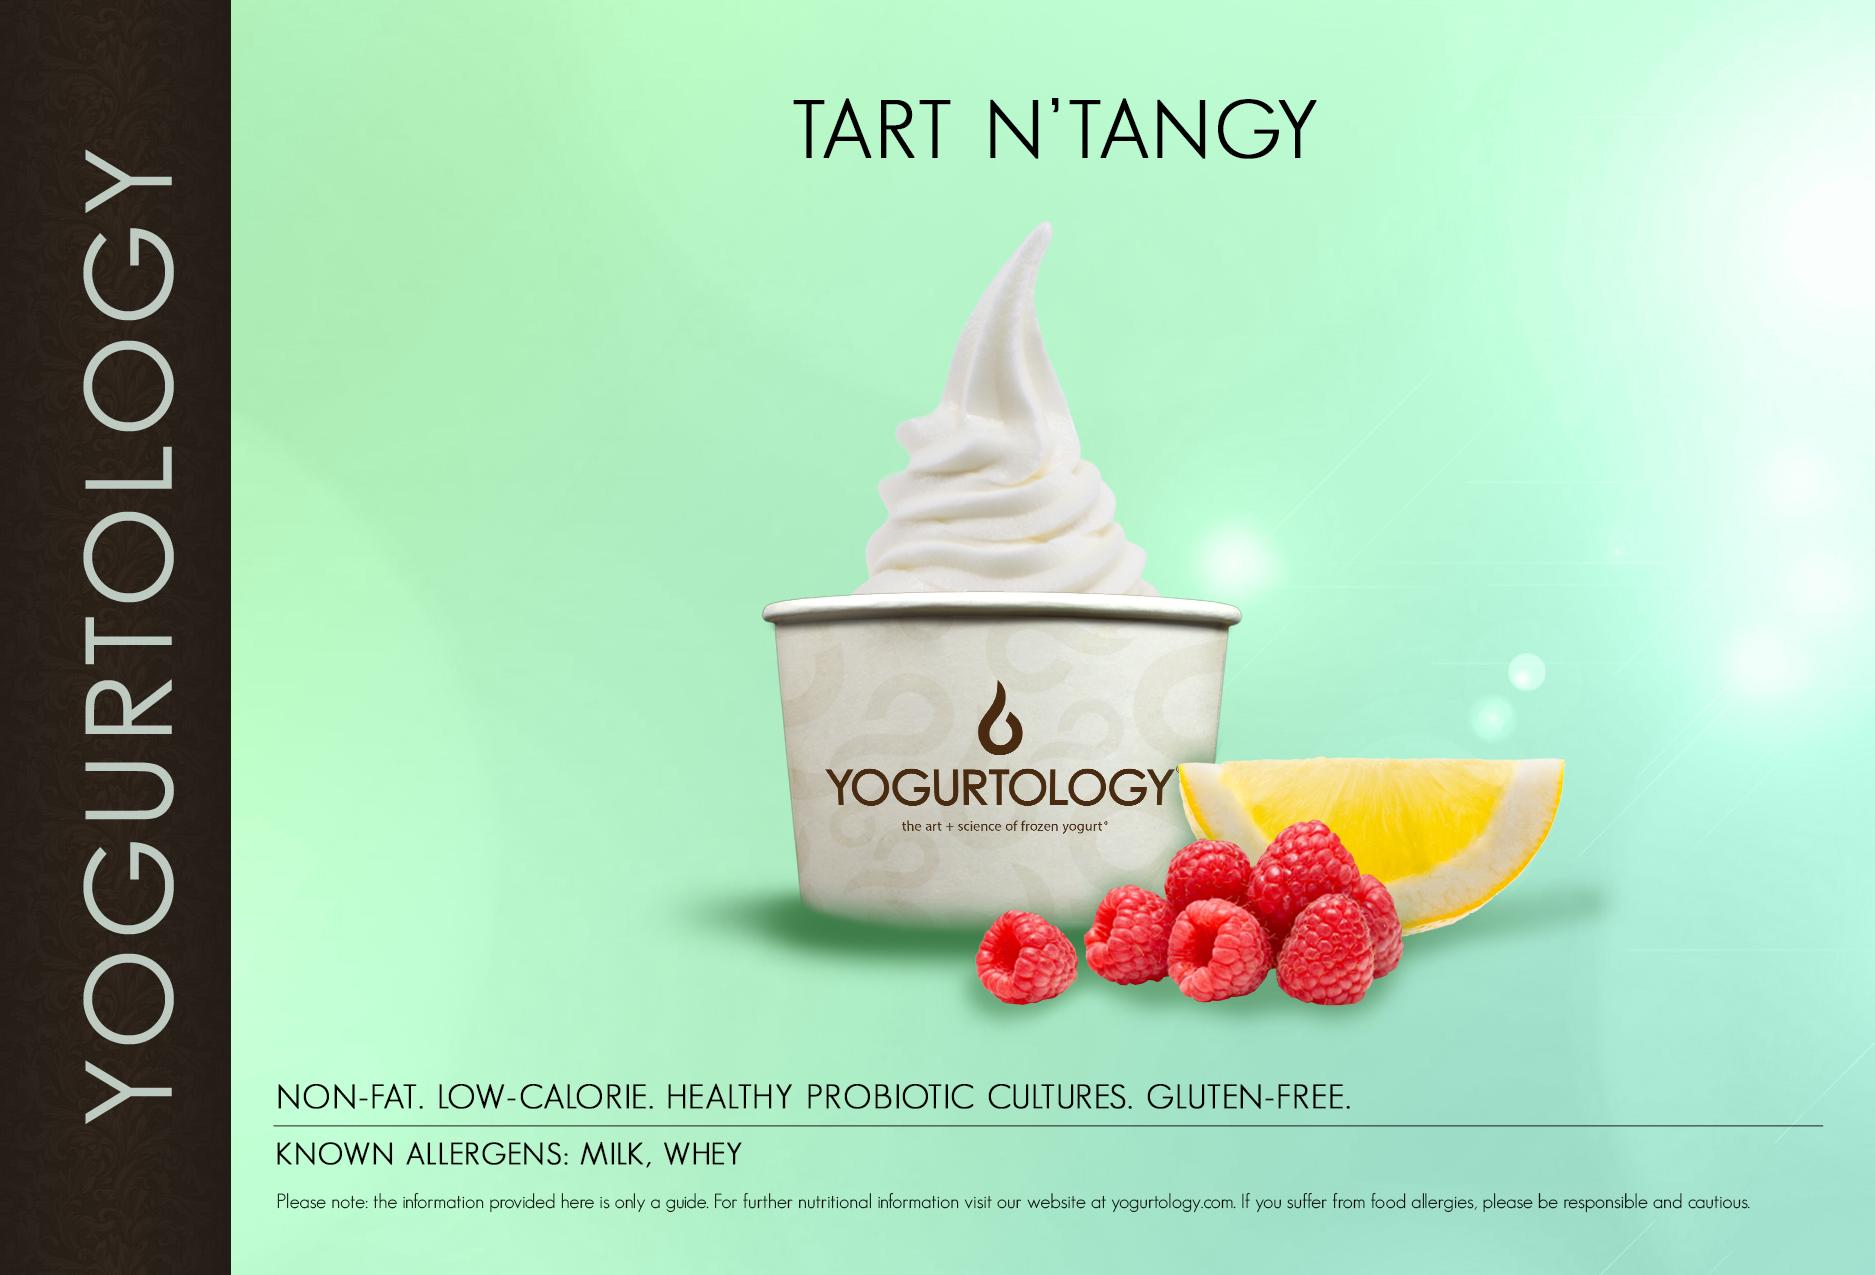 Tart N Tangy